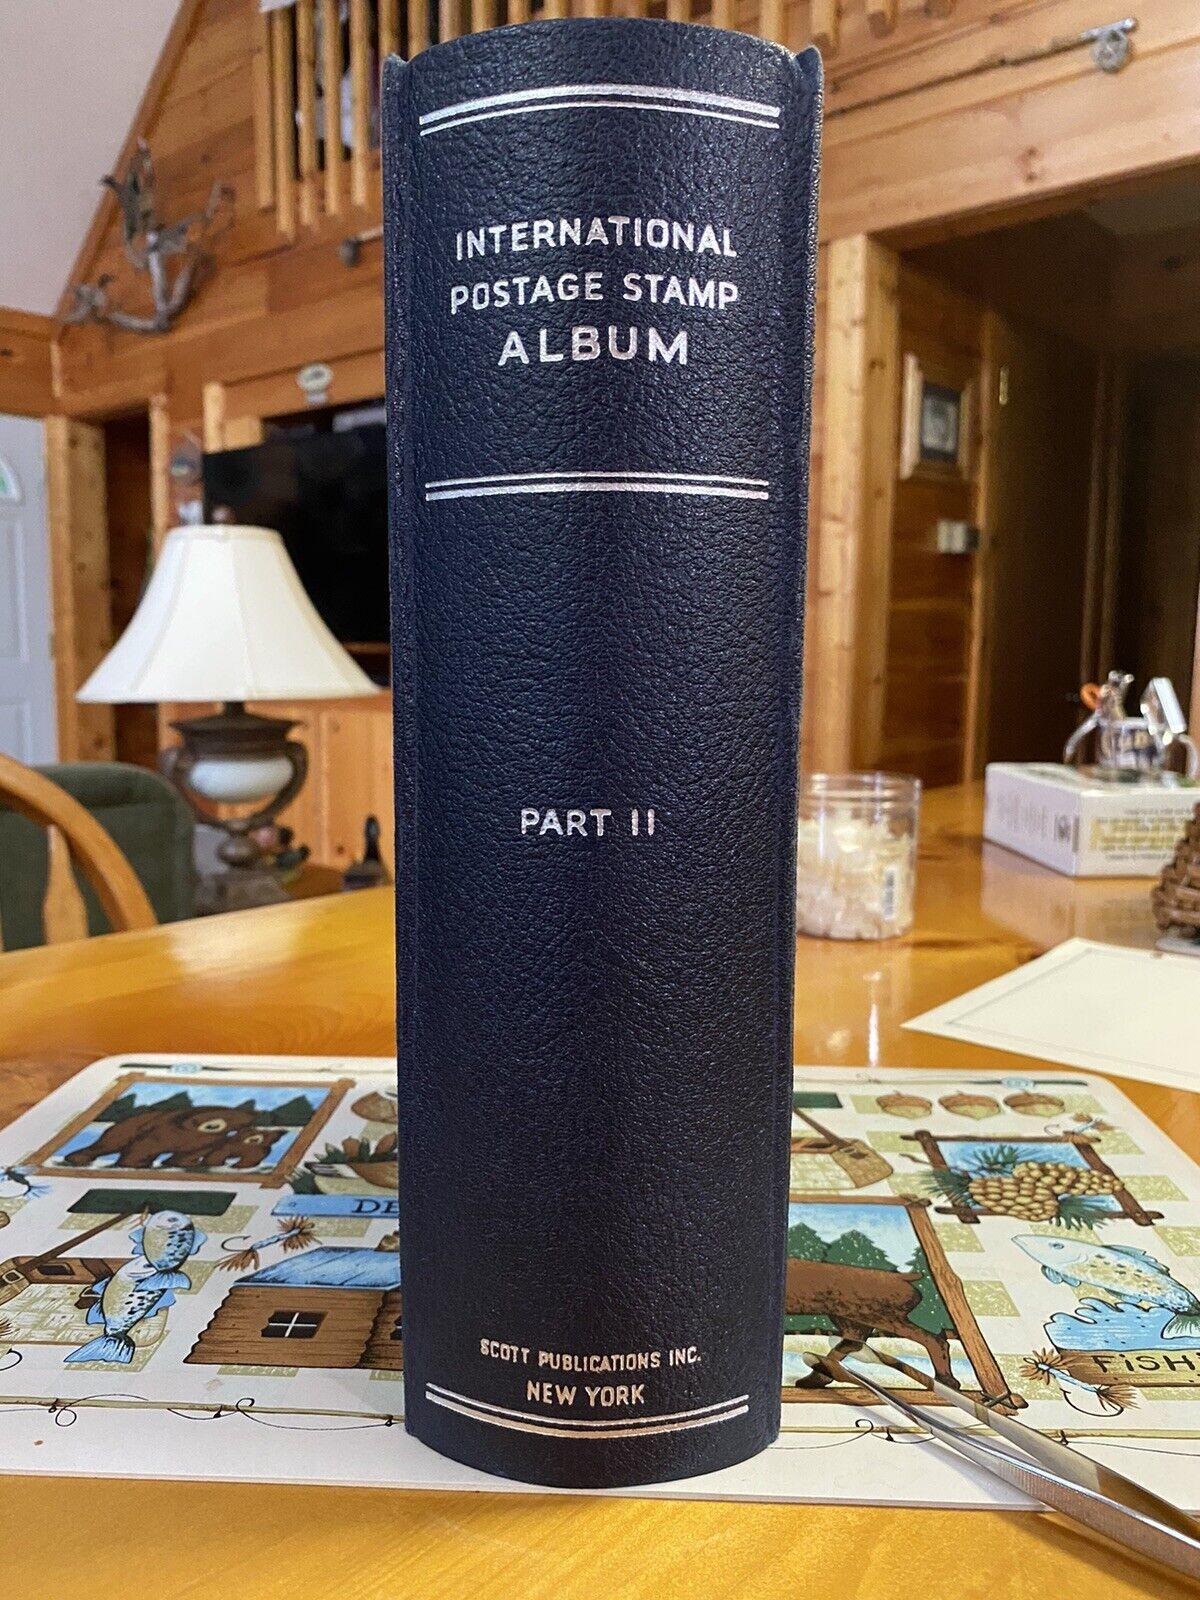 Scott s International Album Part II - A To Z, No U.S. - Pages, Binder Stamps - $69.99